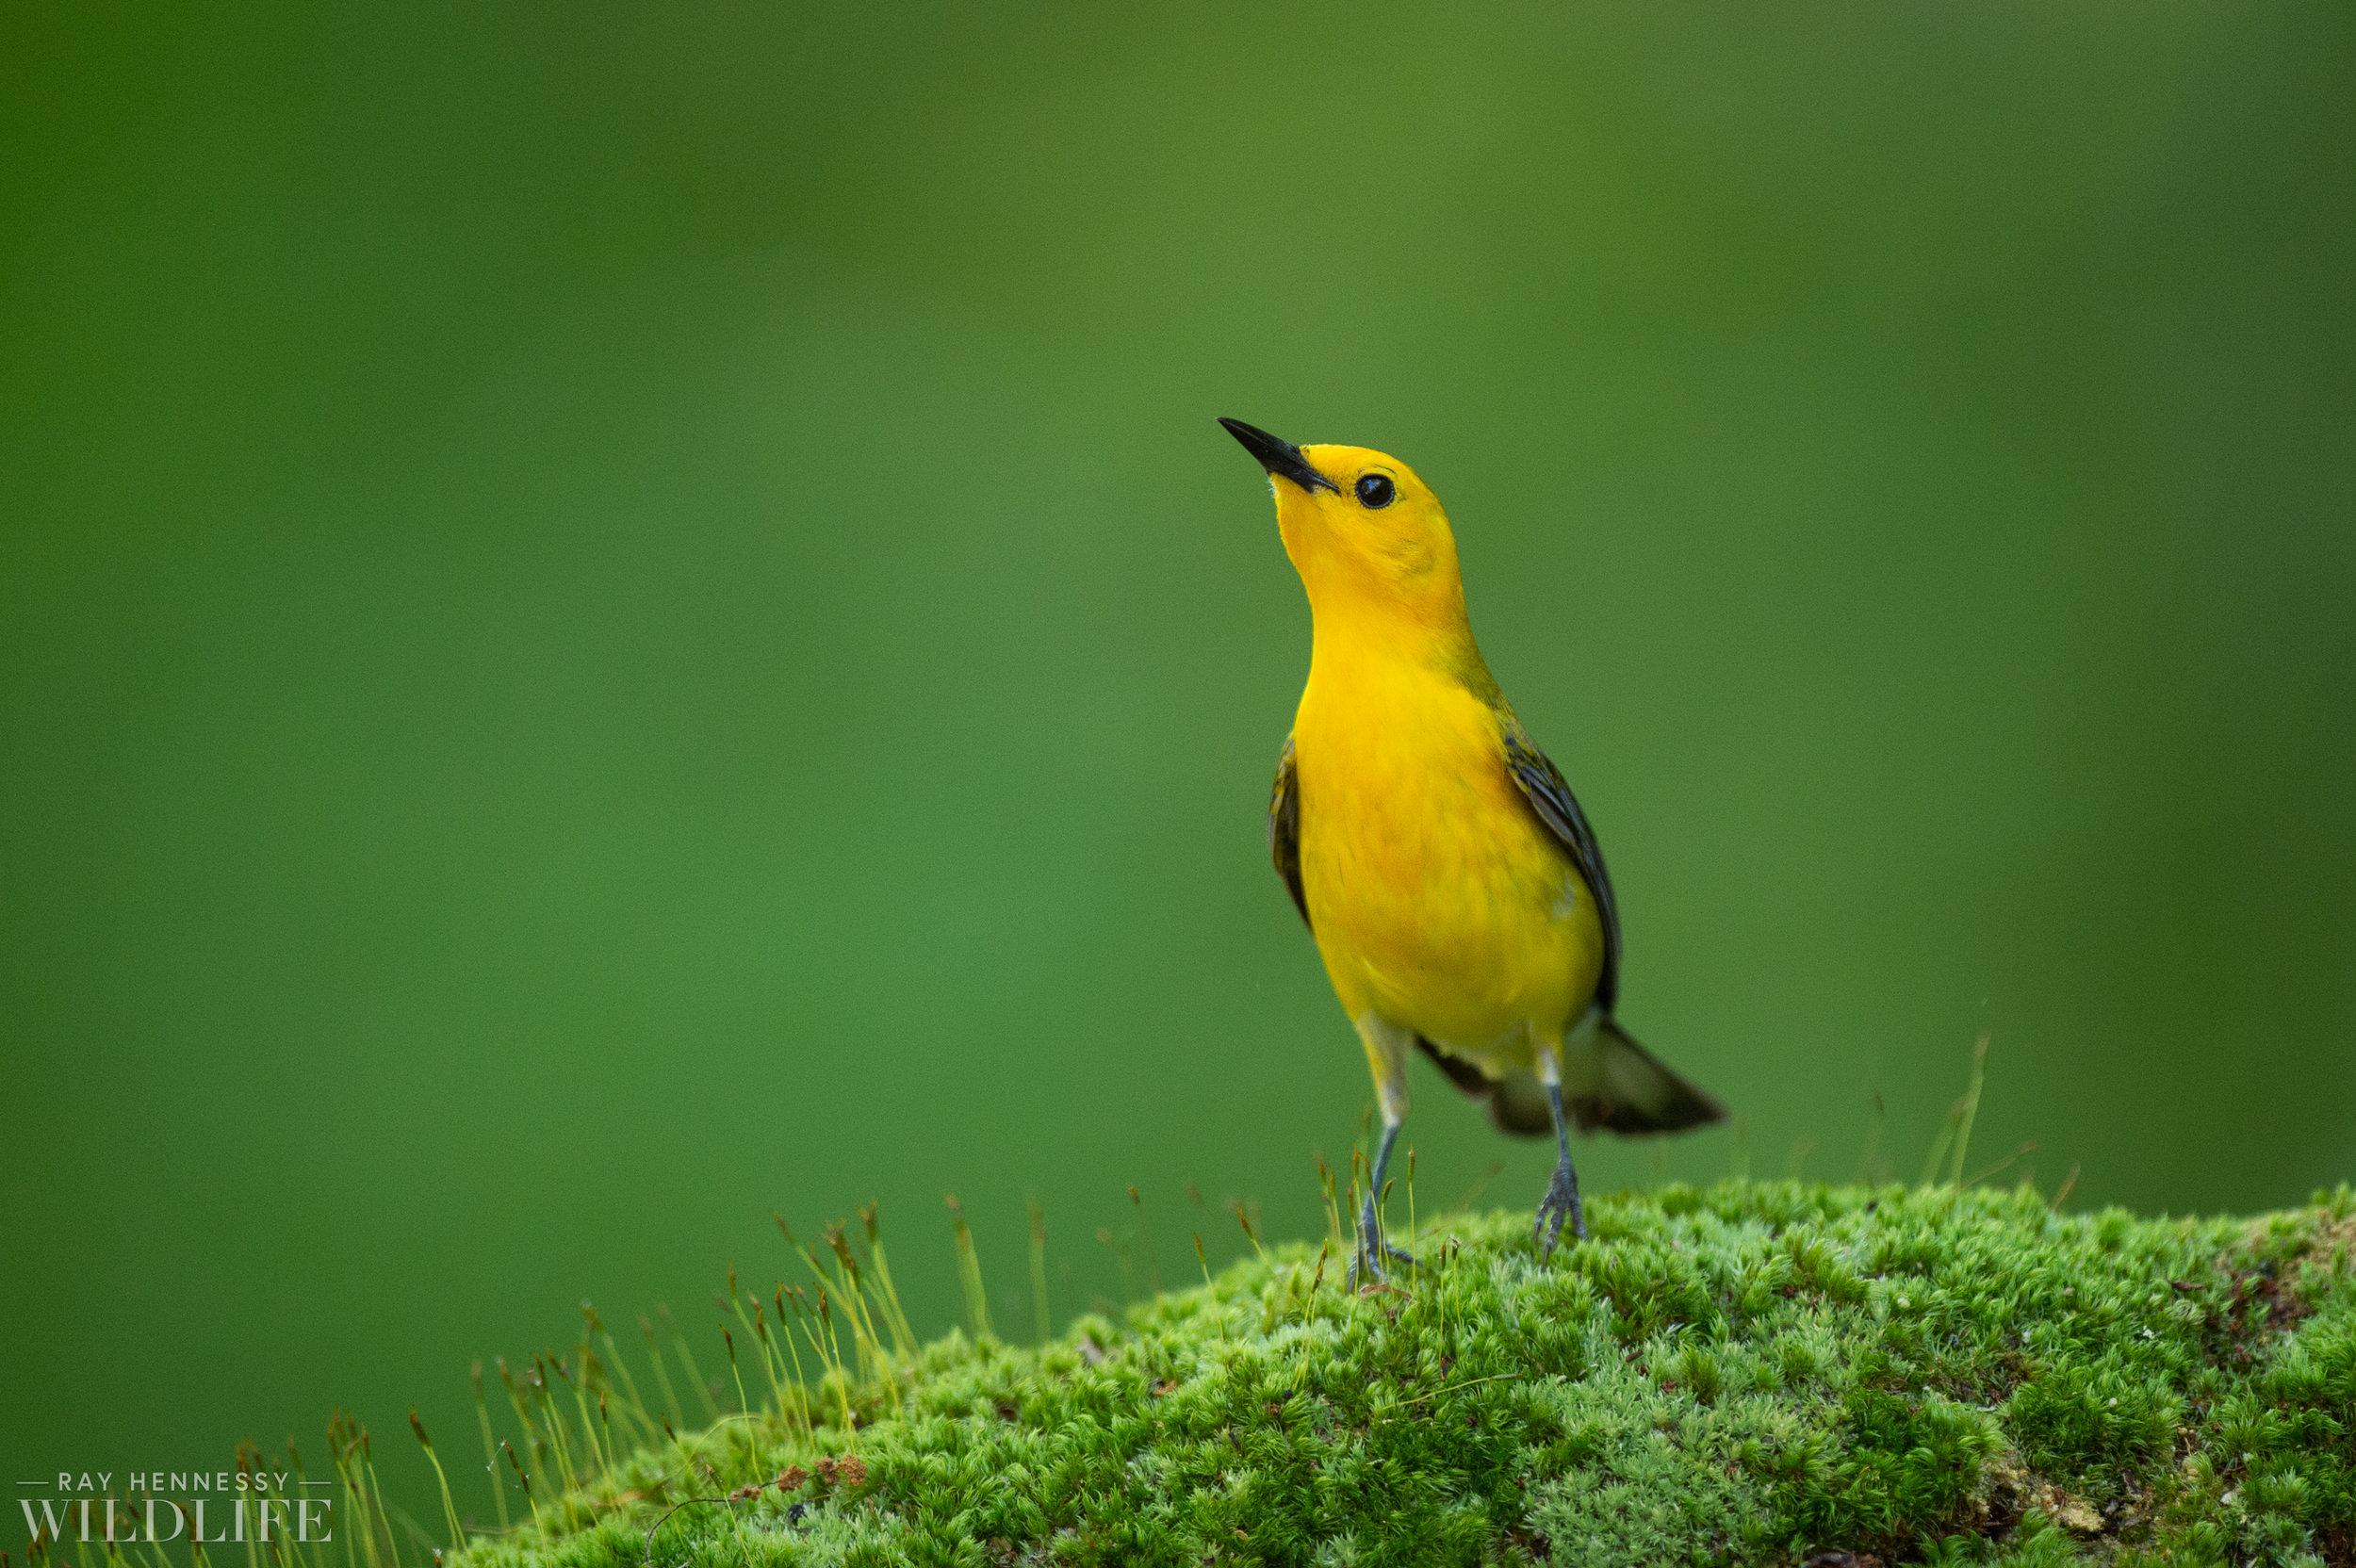 022_shorebirds-prothonotary-warbler.jpg